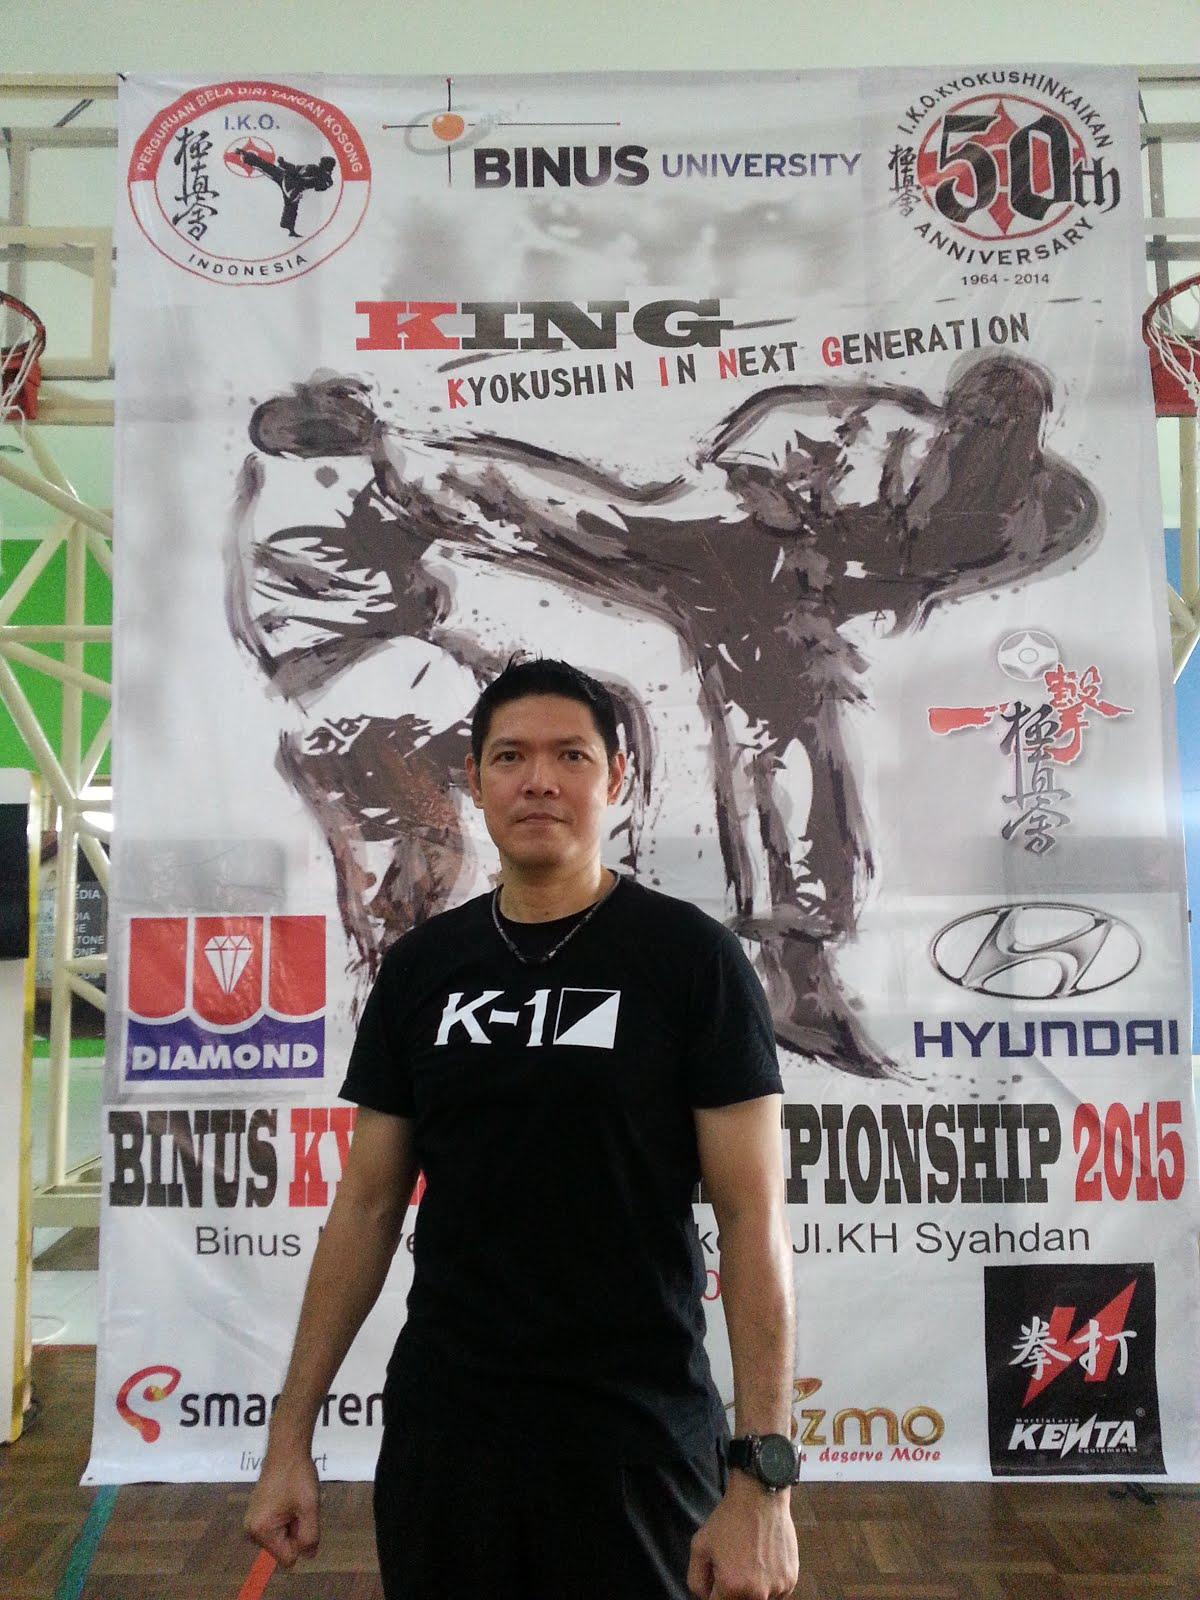 Binus Kyokushin Championship 2015